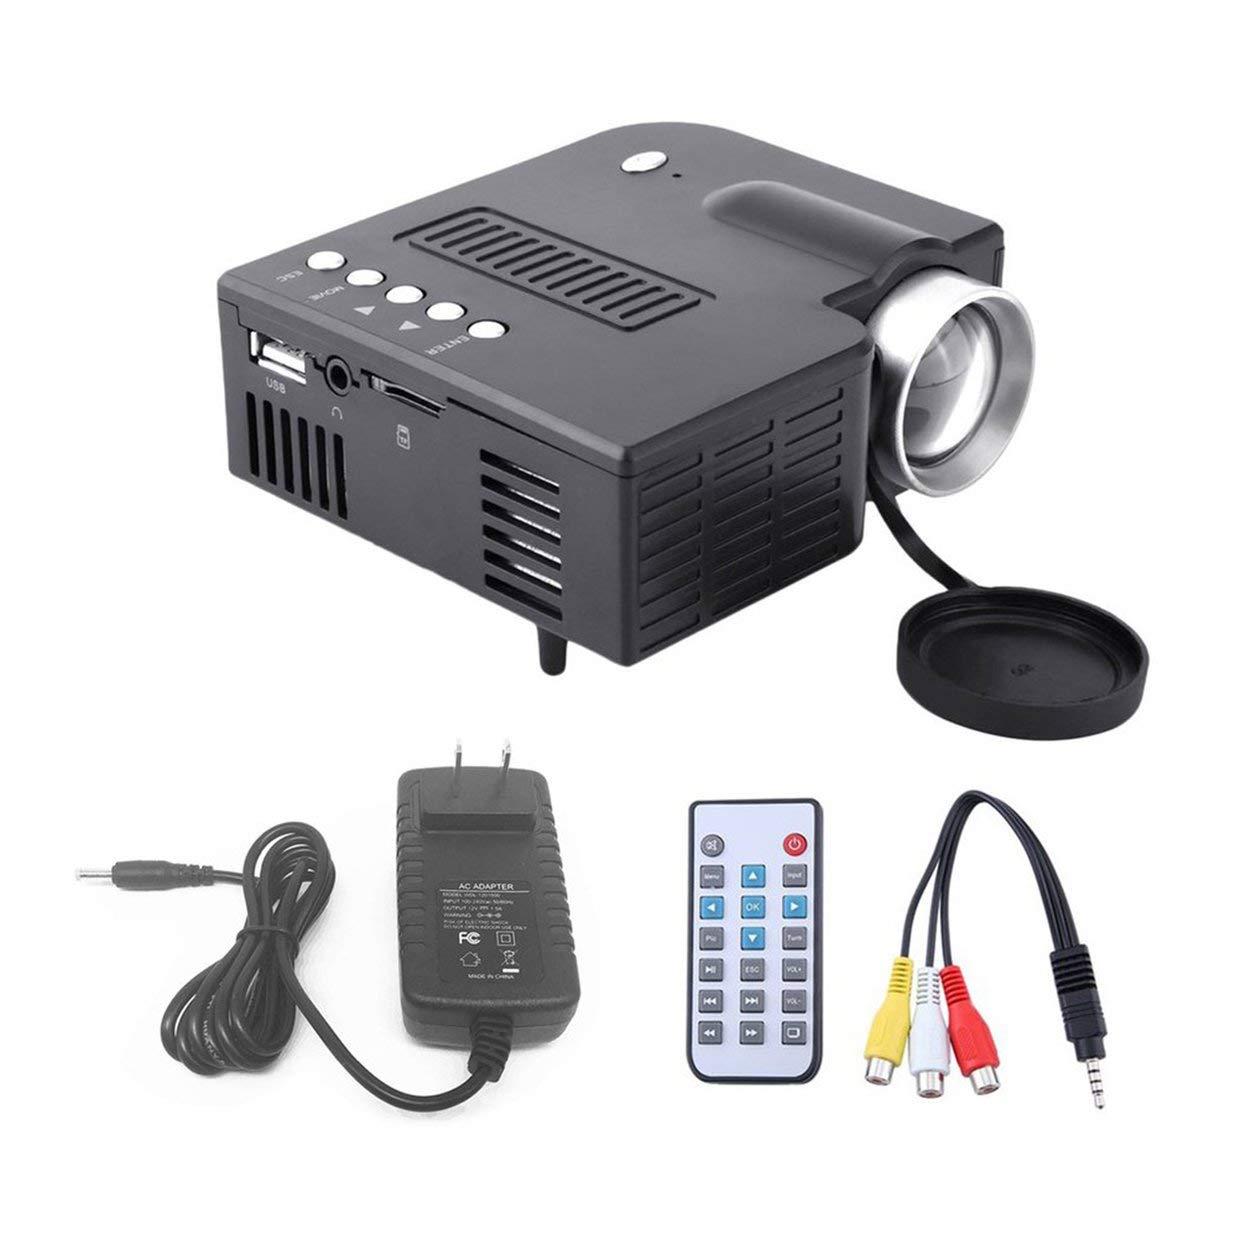 UC28A Conveniente Portátil HD 1080P 1080P 1080P Proyector de Video LED Cine en el hogar Entretenimiento Multimedia PC USB TV AV Proyector de Video 8bc49c